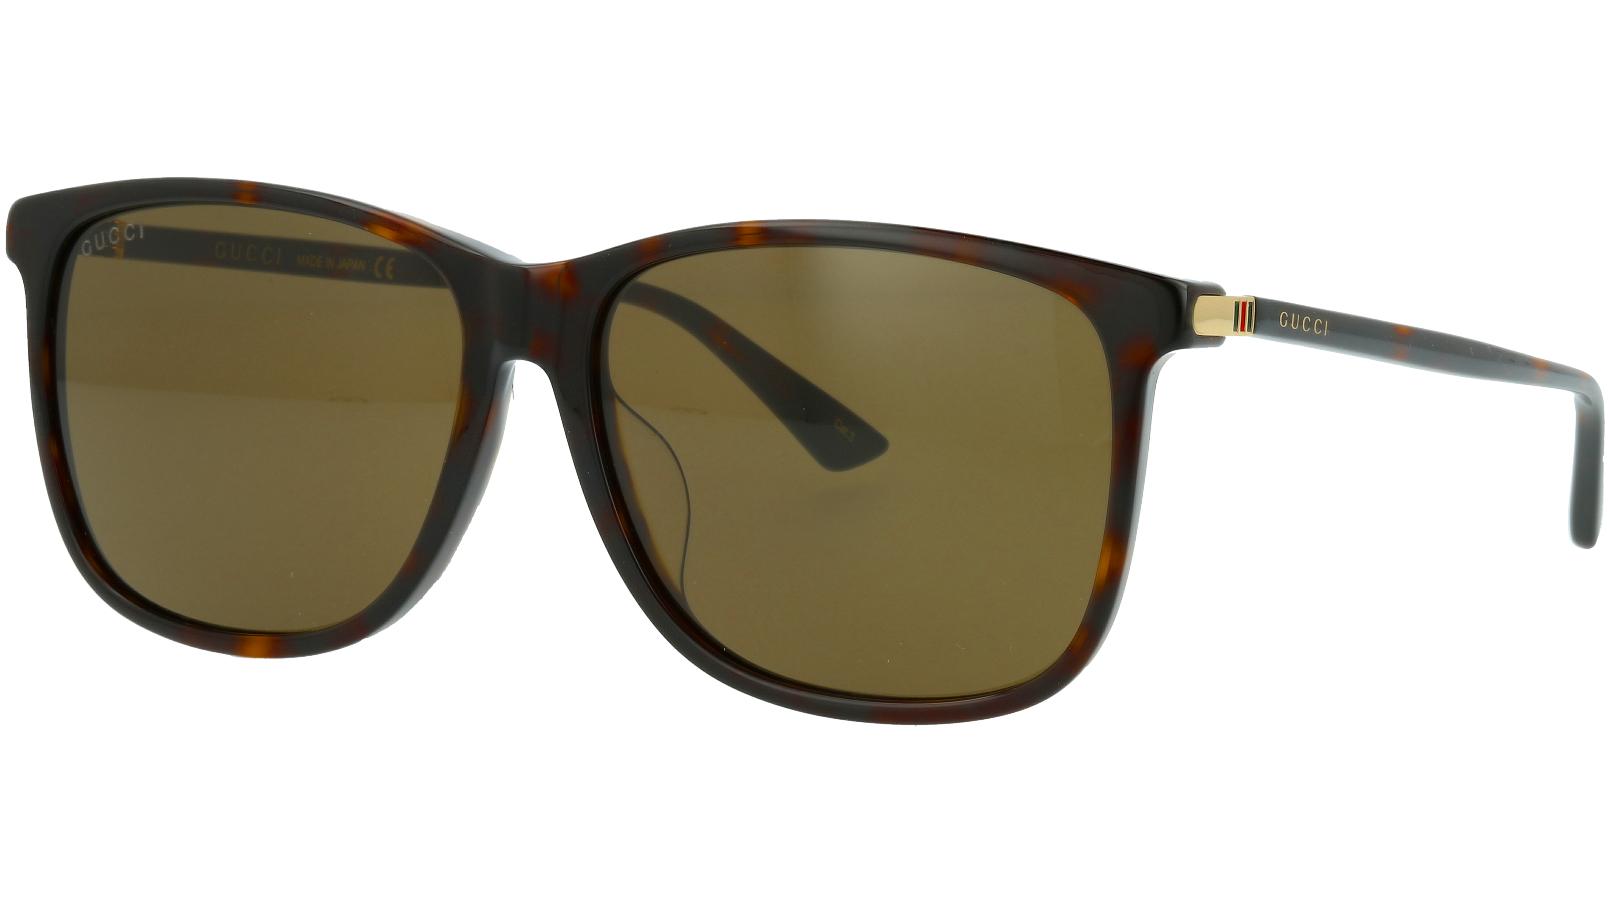 Gucci GG0017SA 002 58 AVANA Sunglasses